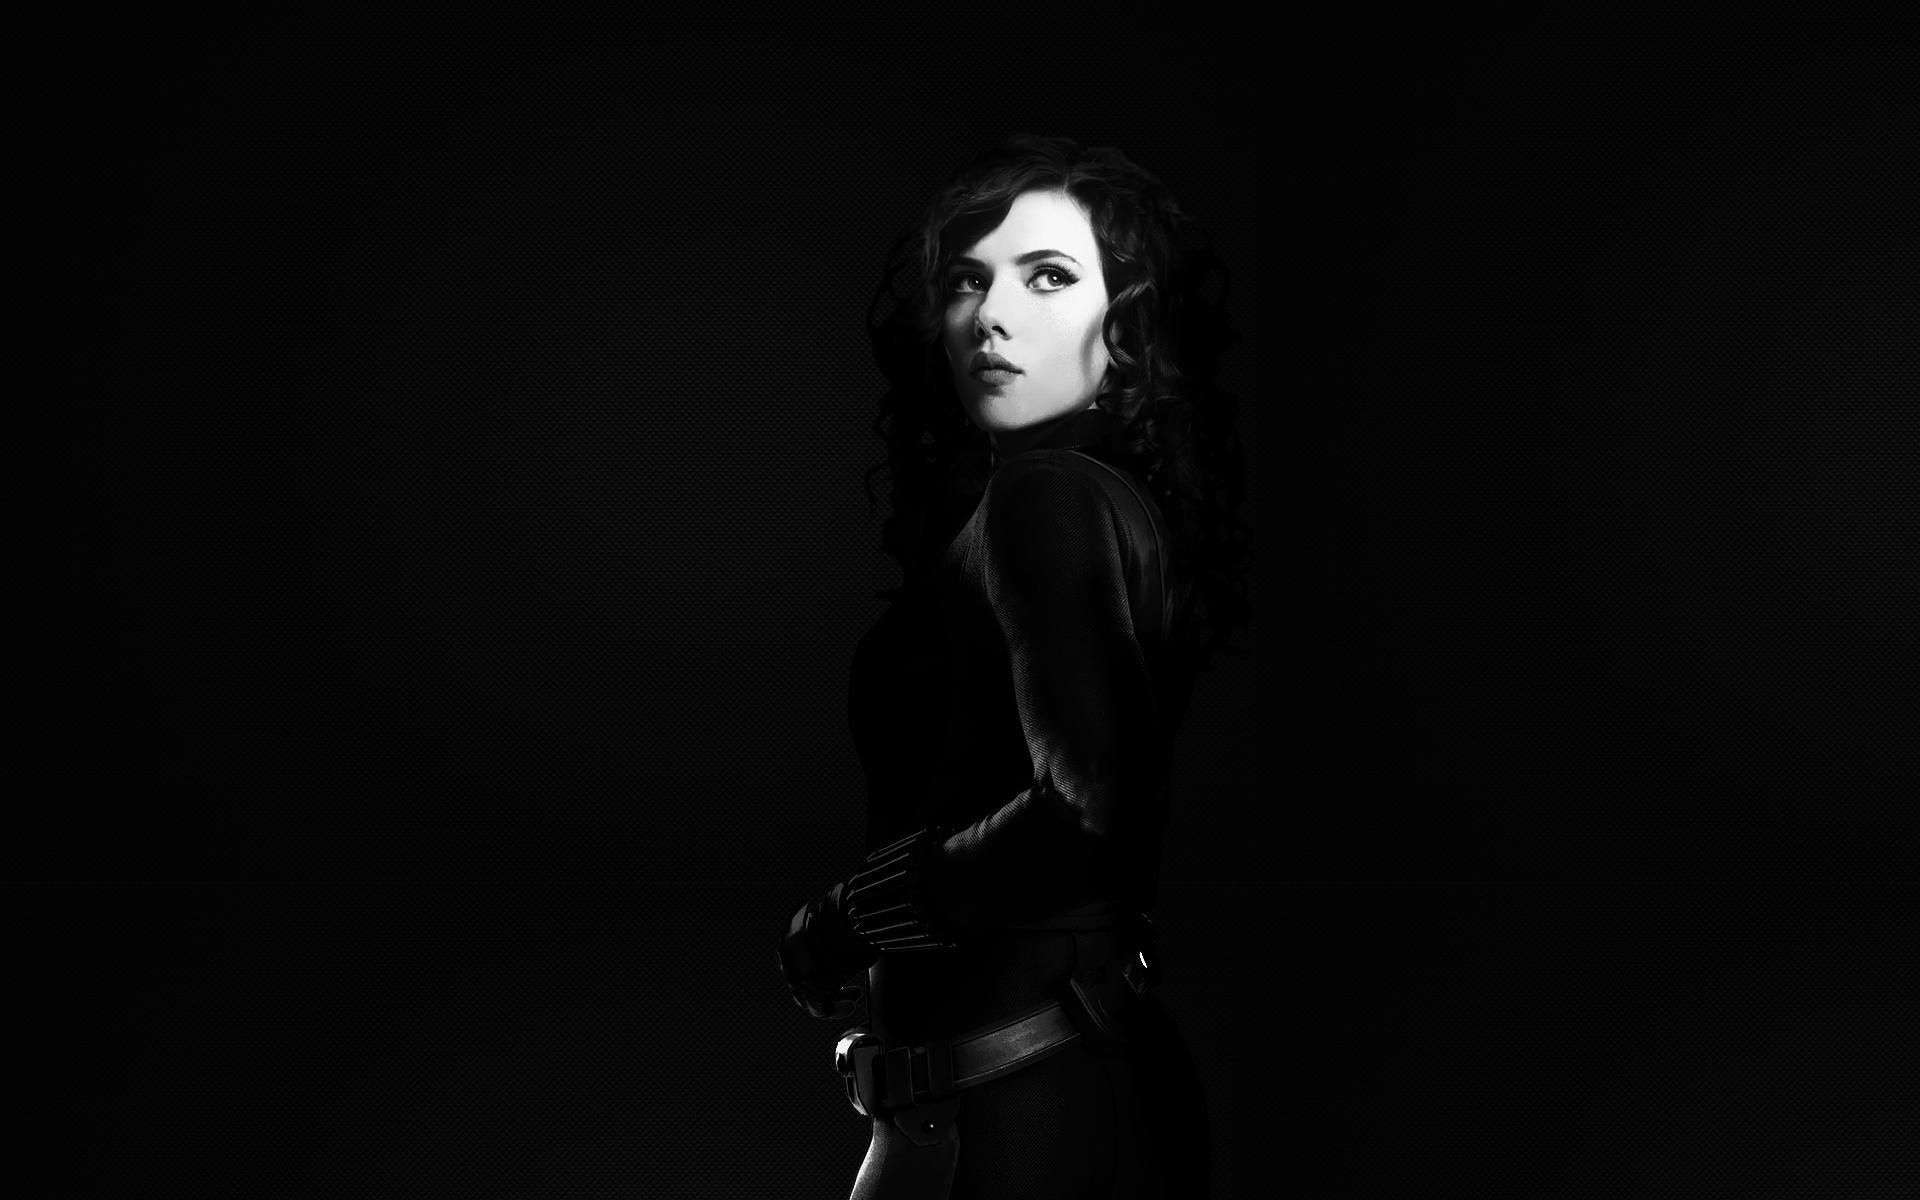 Scarlett Johansson Black Widow Wallpaper (76+ Images